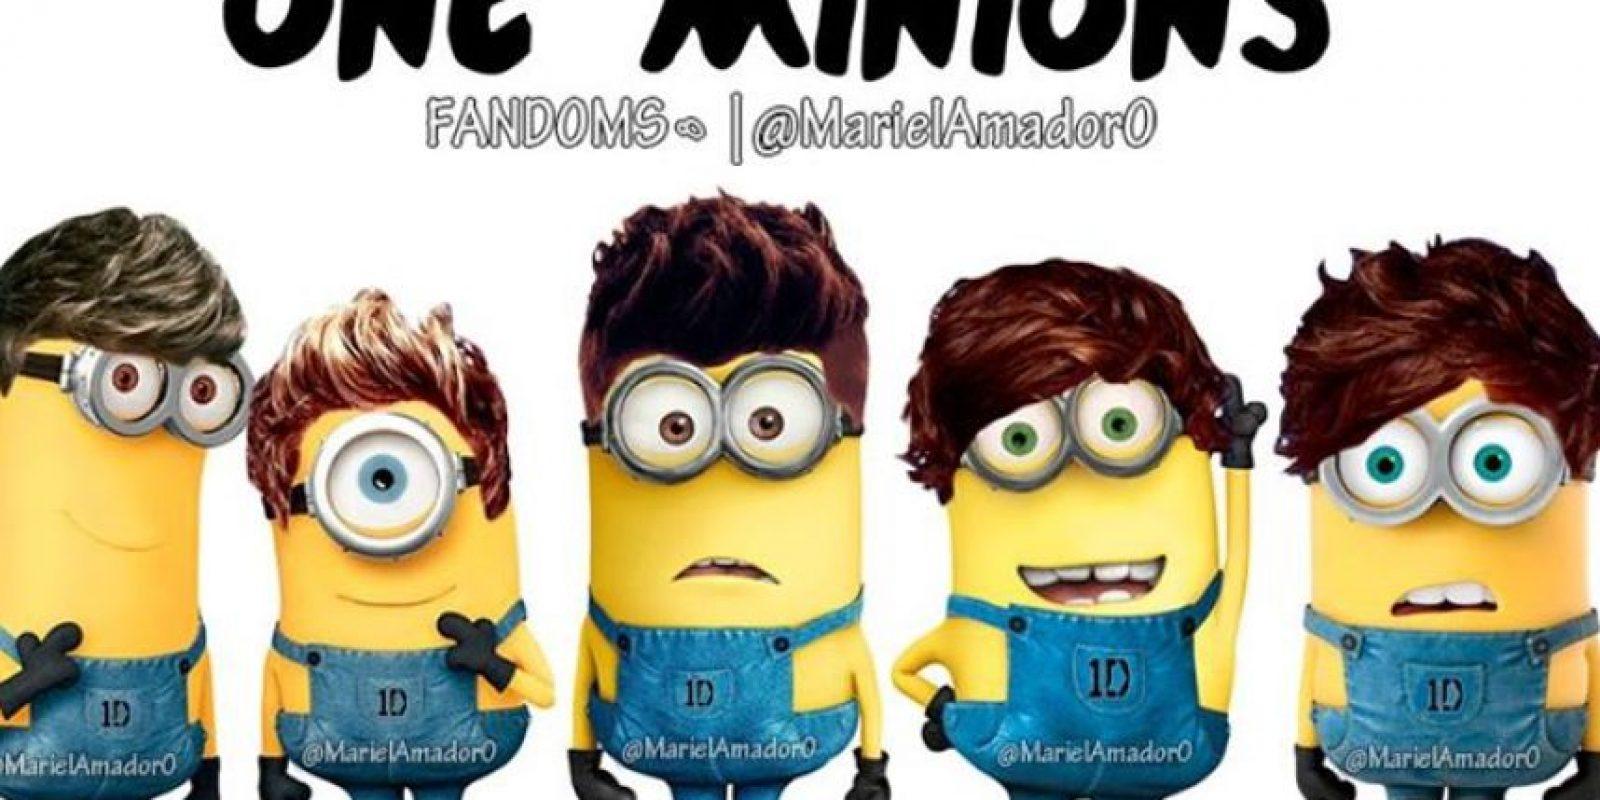 Laim Payne, Niall Horan, Zayn Malik, Harry Styles y Louis Tomlinson Foto:vía twitter.com/mariel_amador